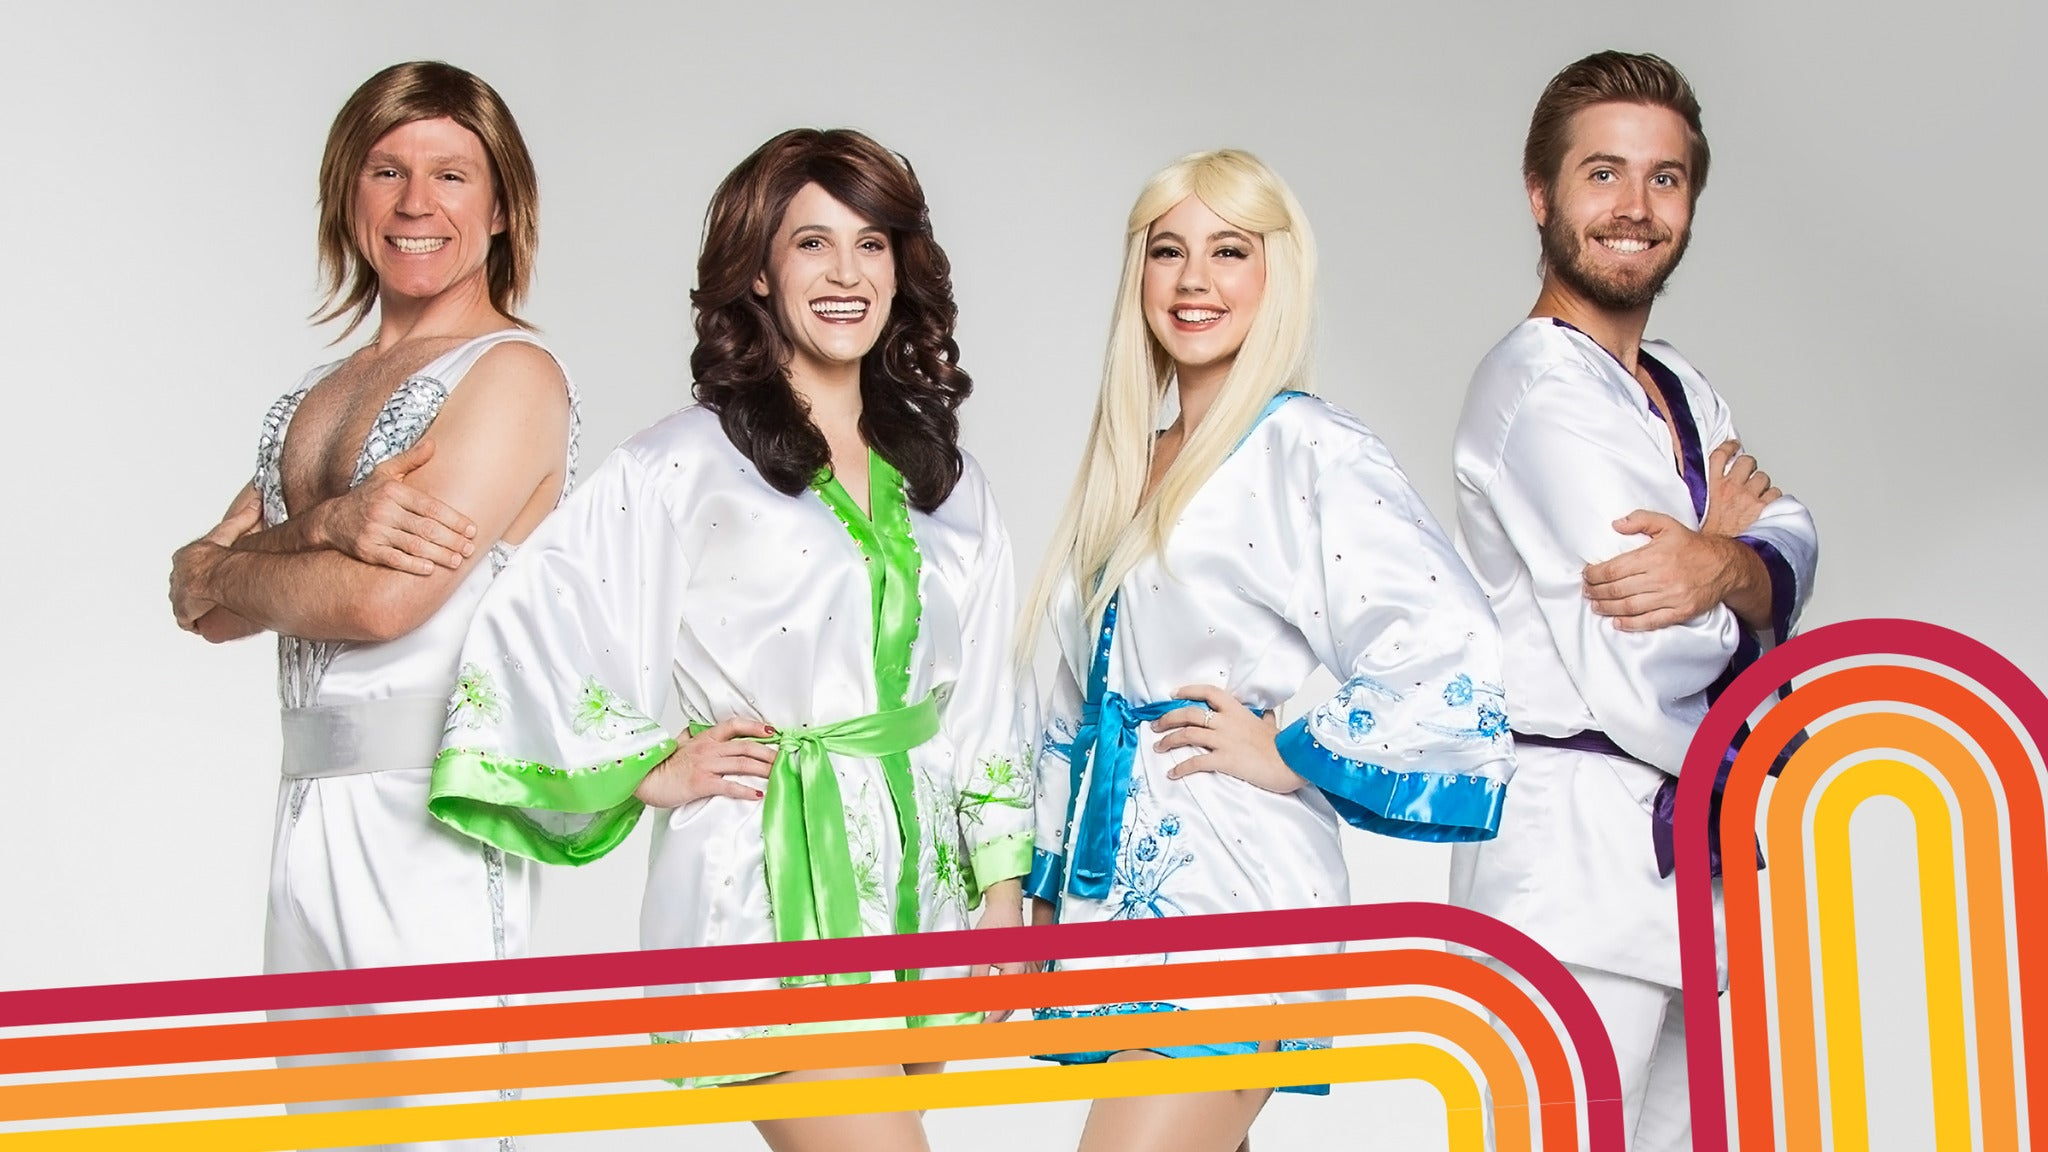 ABBAFAB - ABBA Tribute at Suquamish Clearwater Resort Lawn